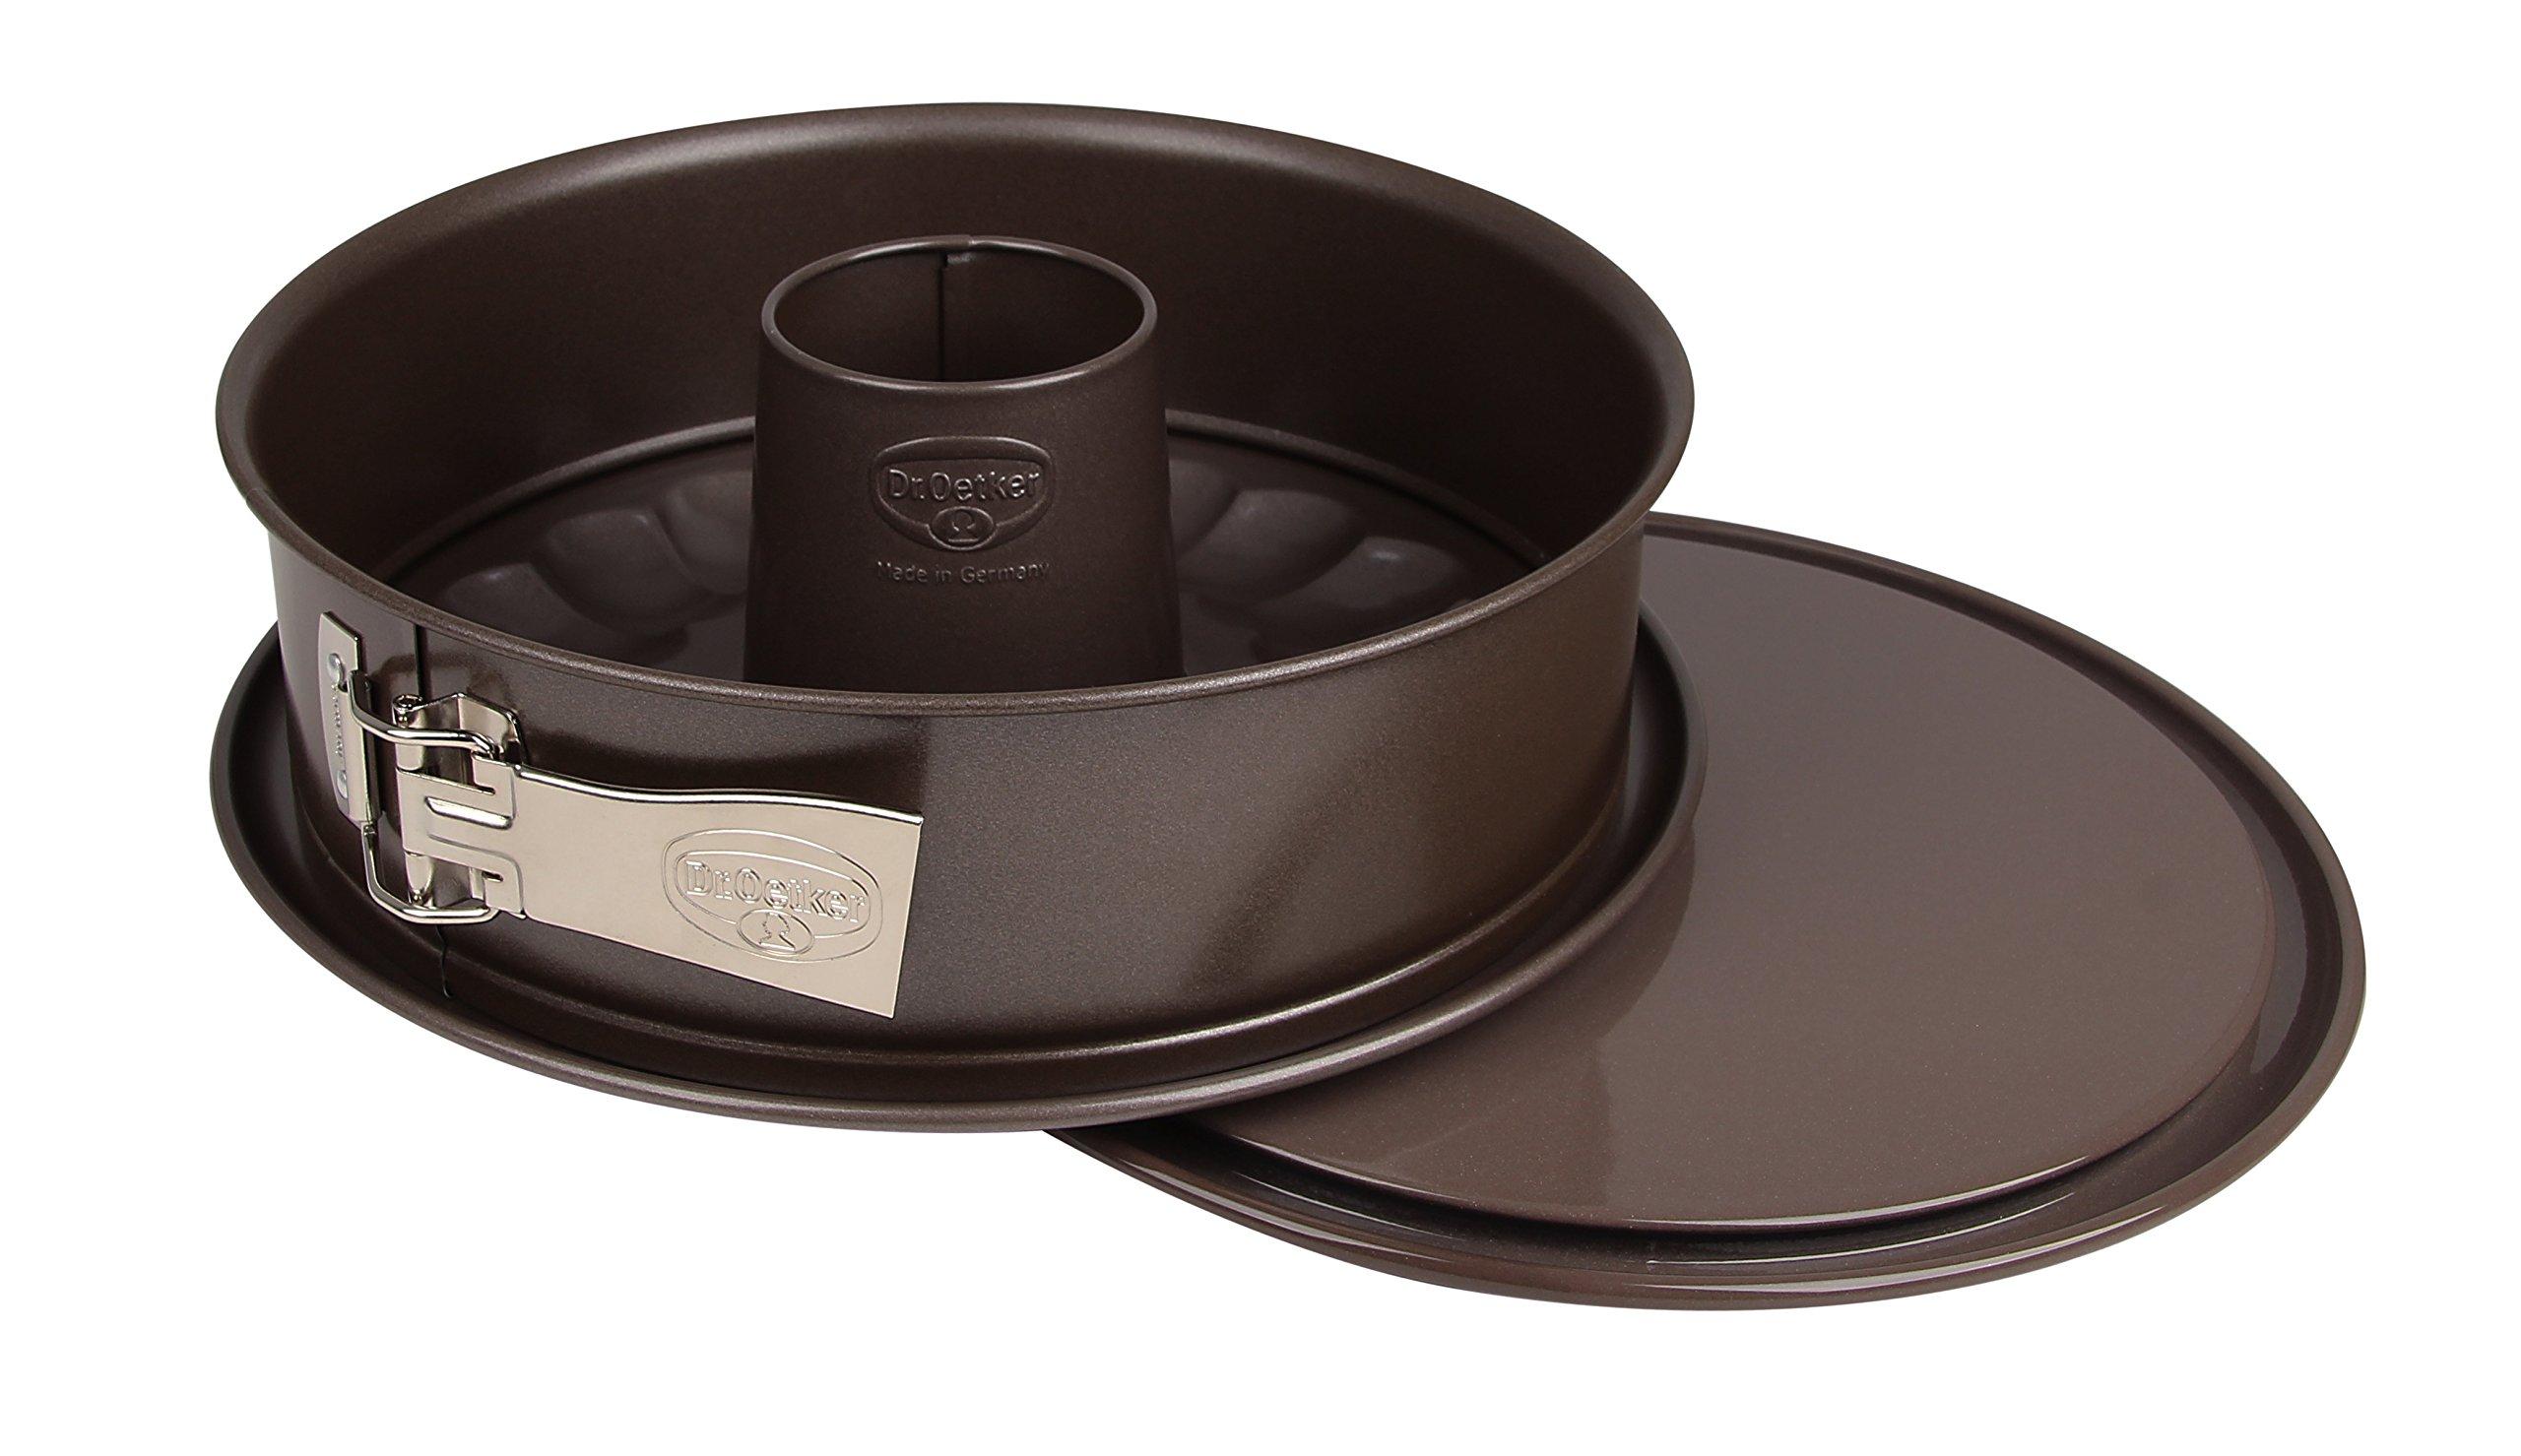 Dr.Oetker Springform Back-Edition with Enamel-and Non-Stick-Server-Plate Ø26 cm in Black, 26 x 26 x 7 cm